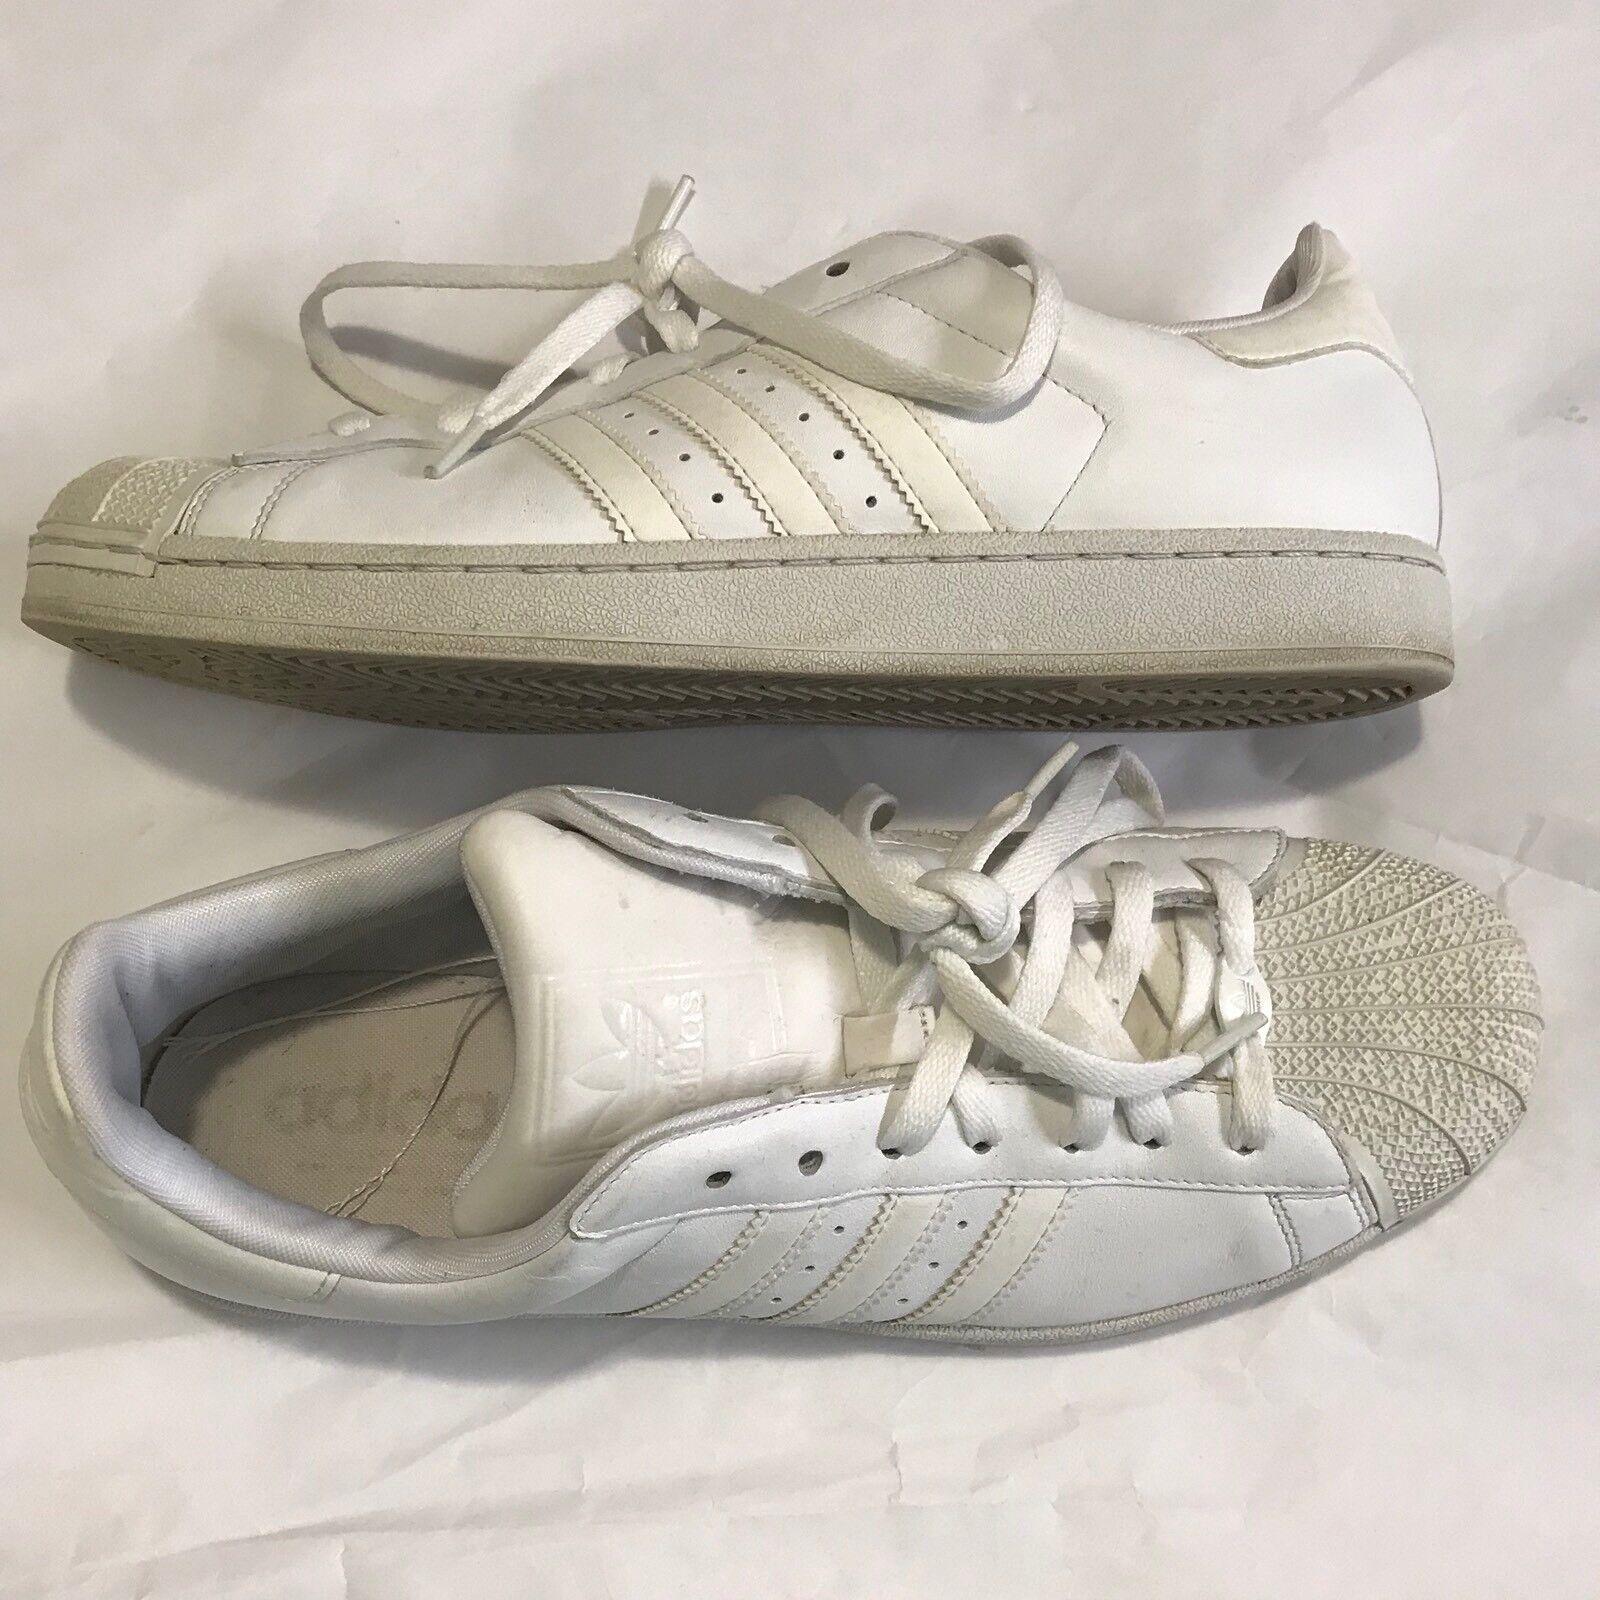 Adidas Men's Superstar Original Shell Toe Sneakers Comfortable